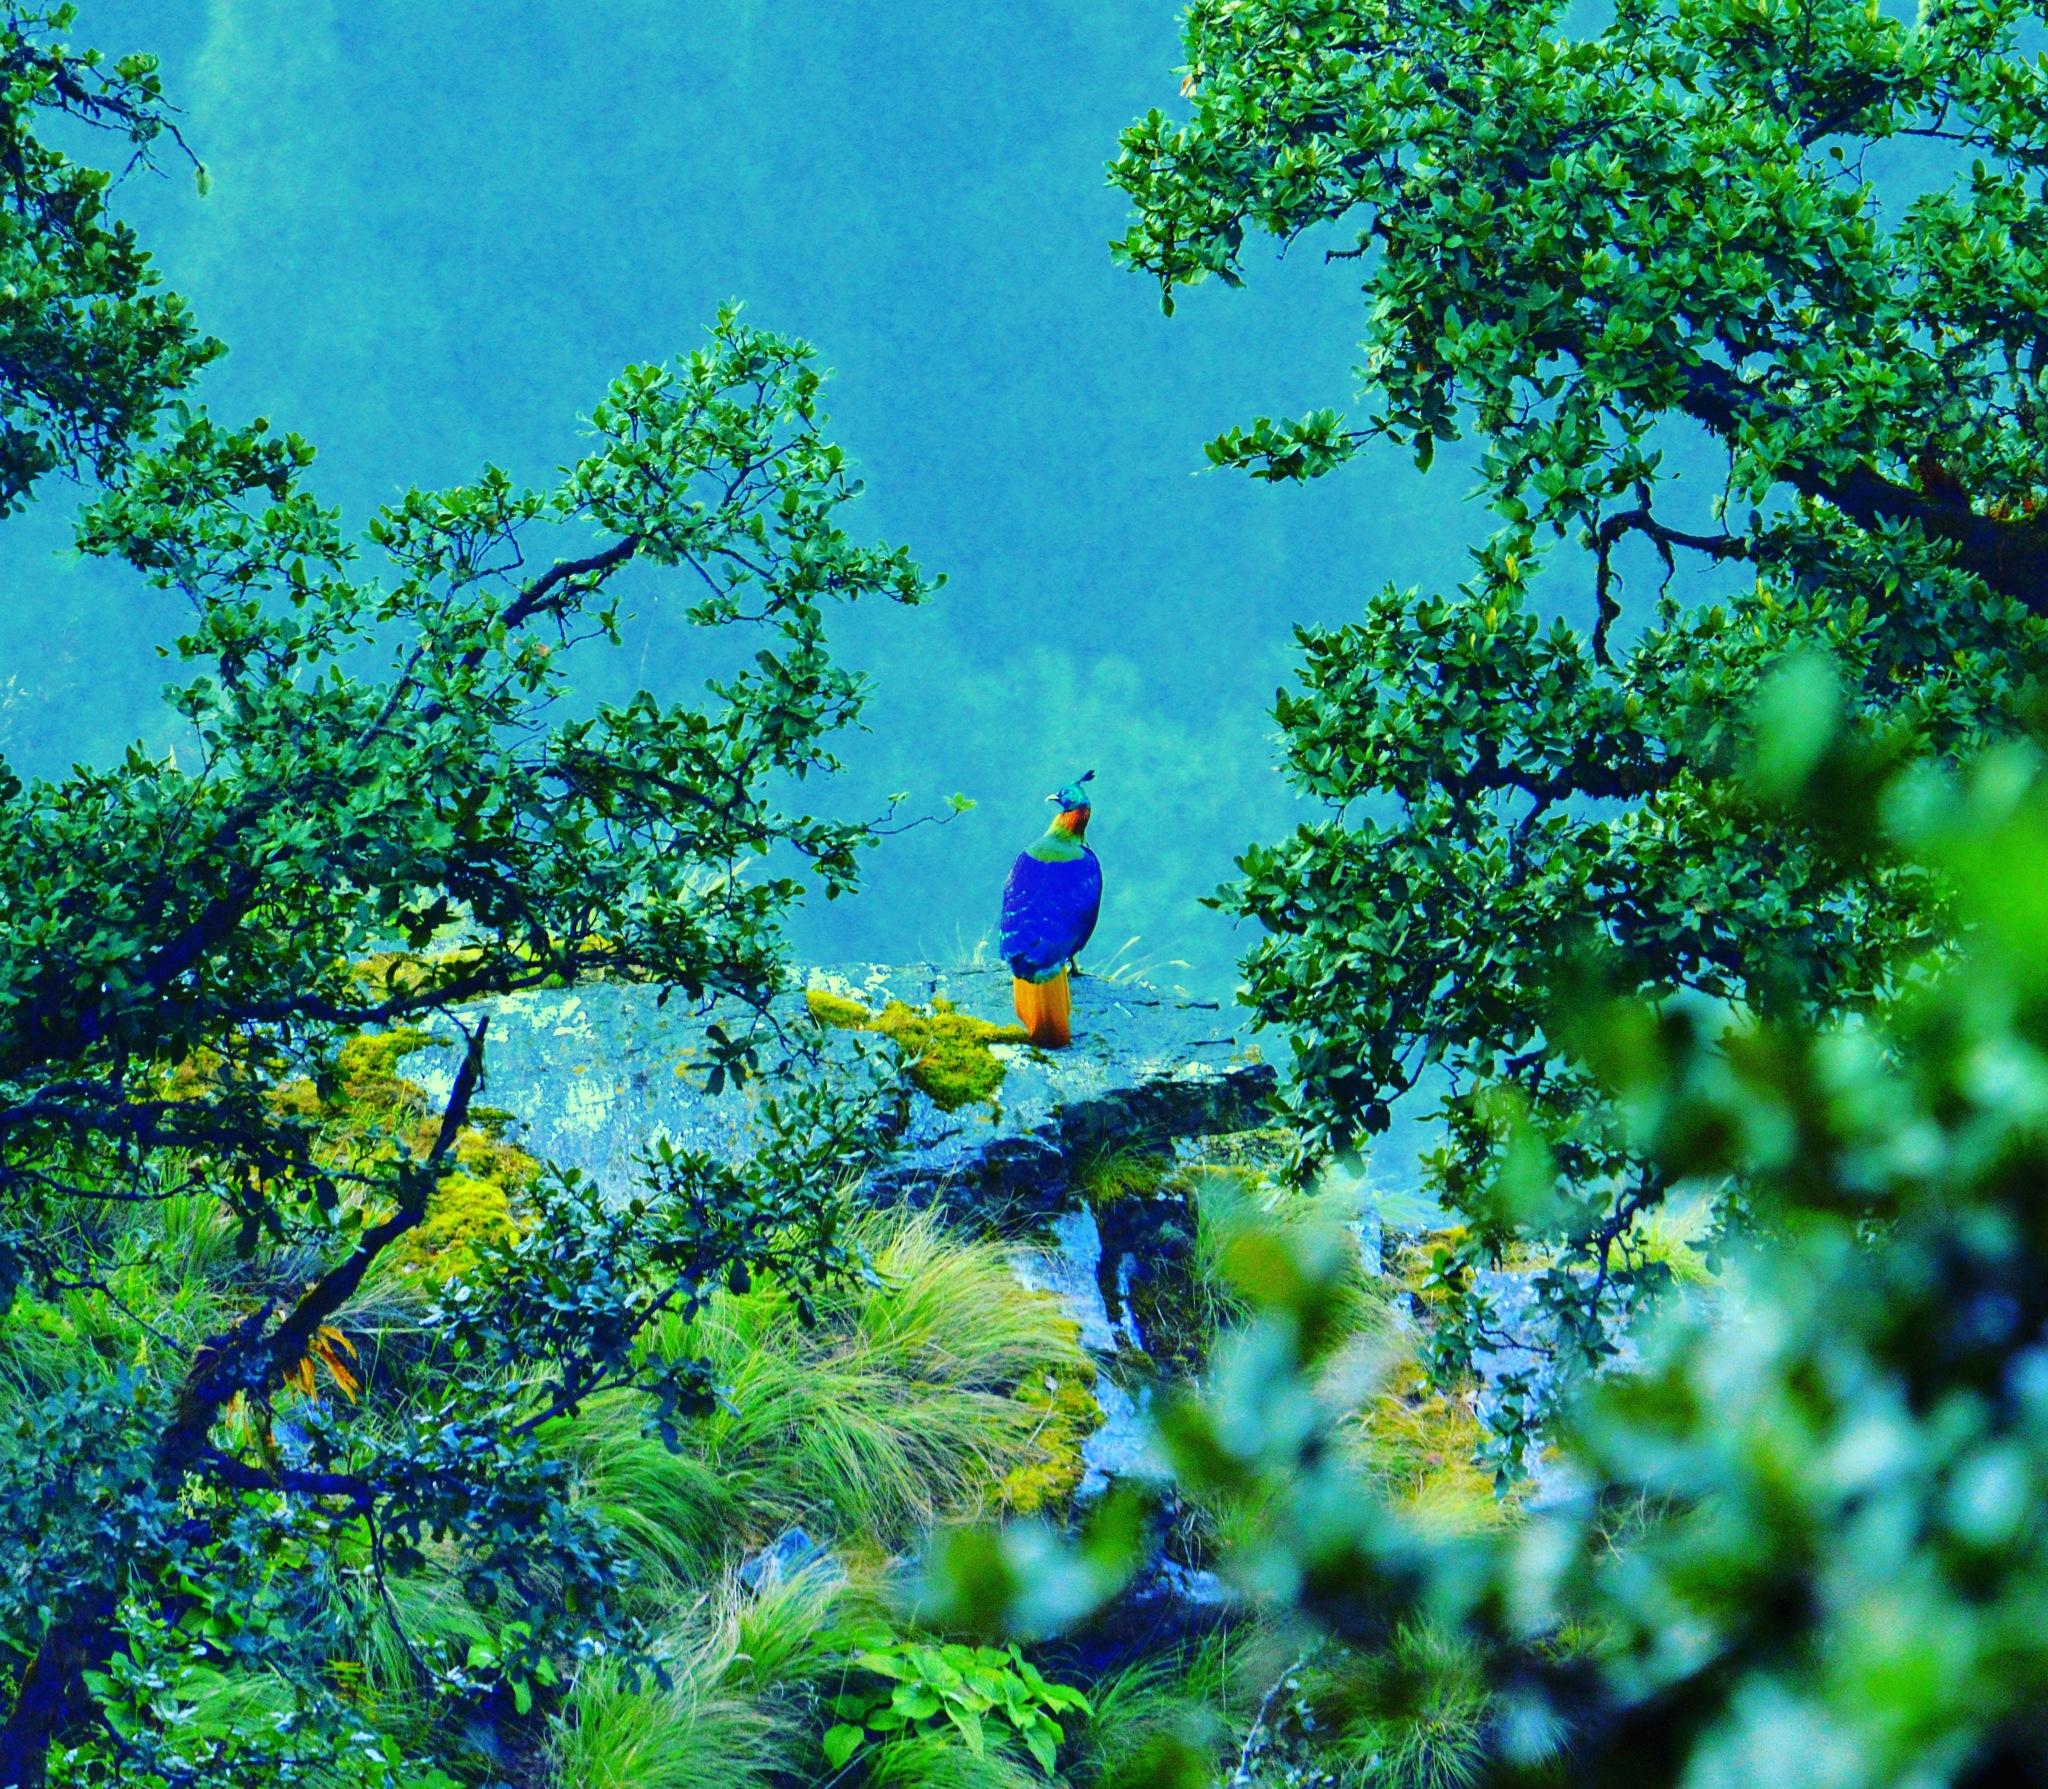 Himalayan Monal by Sarang Mishrikotkar